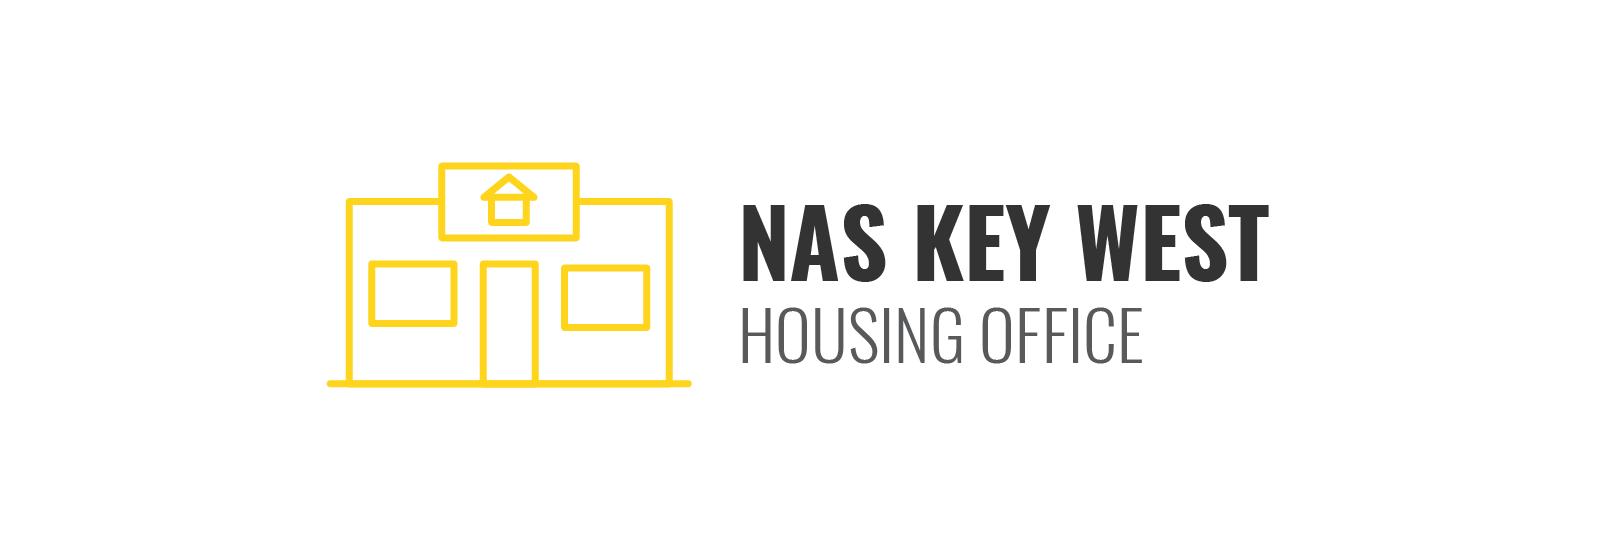 NAS Key West Housing Office